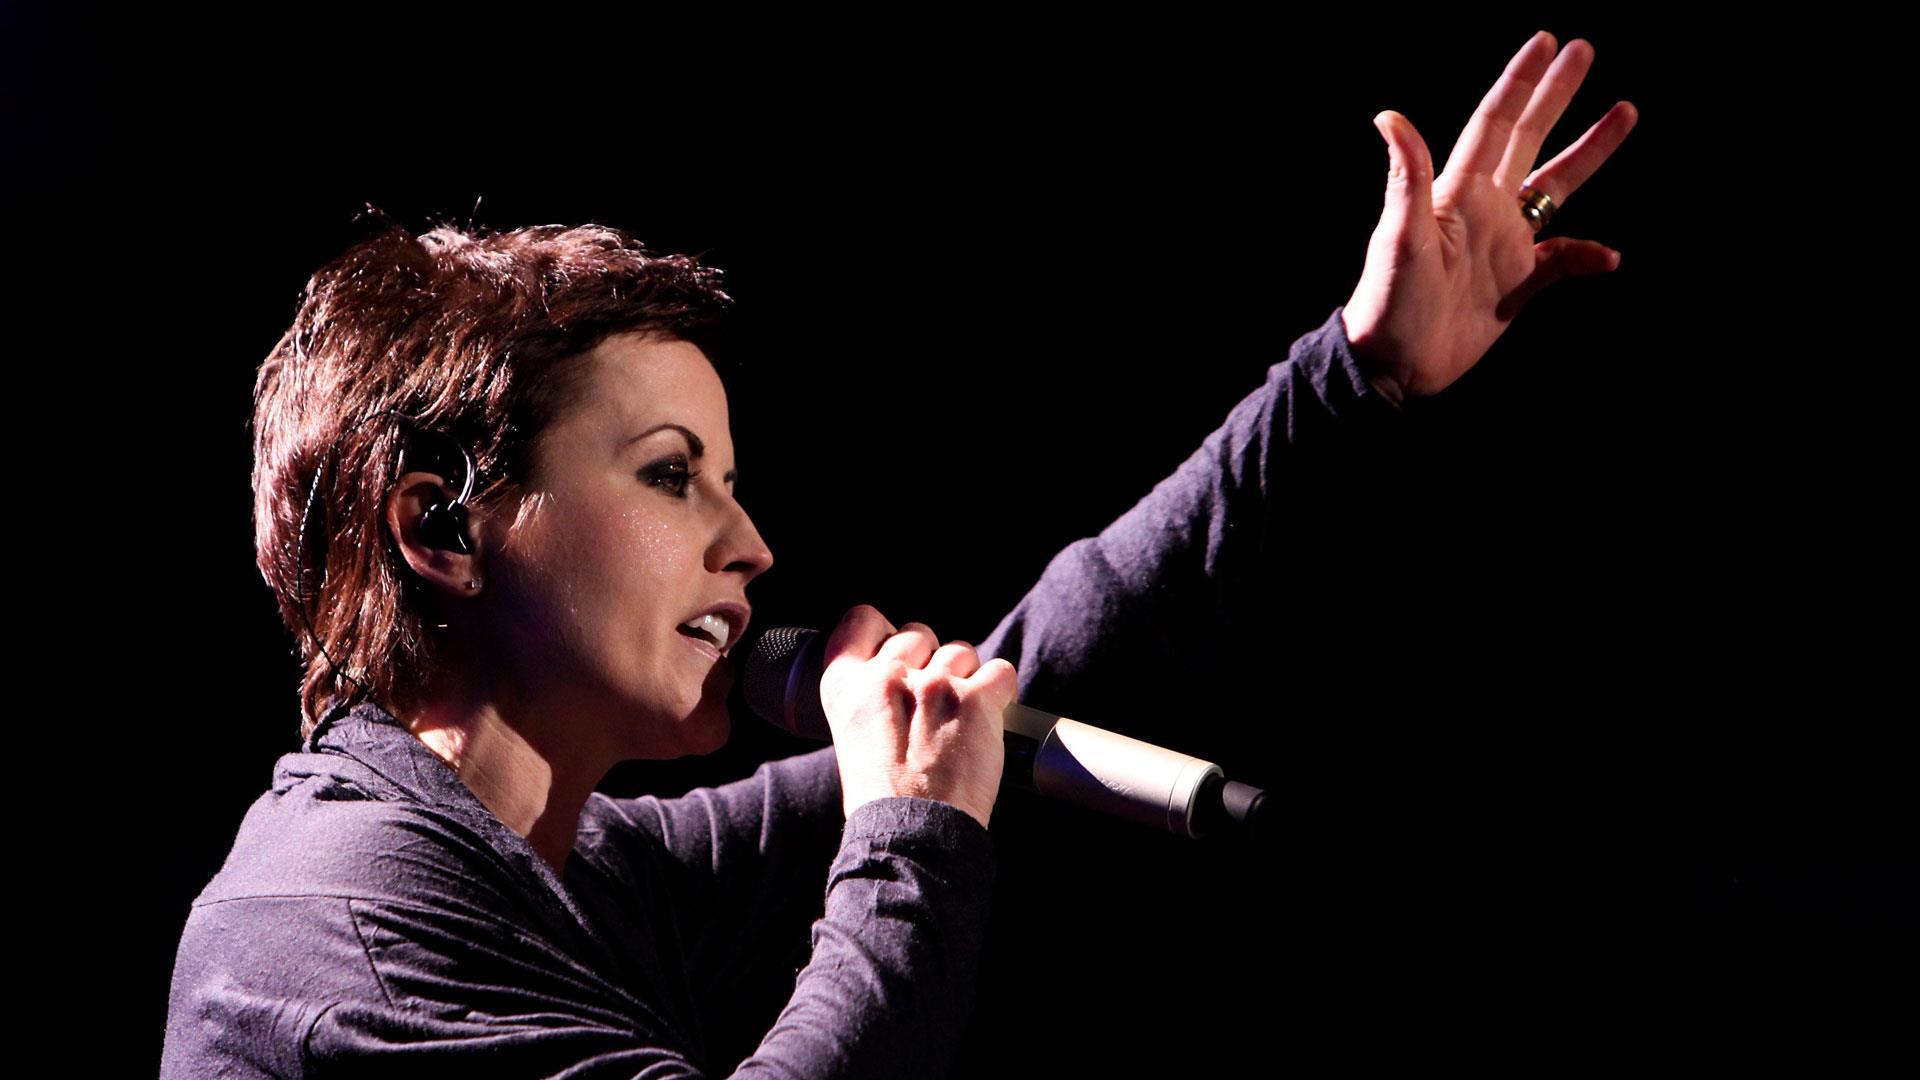 The Cranberries' lead singer Dolores O'Riordan dead at 46